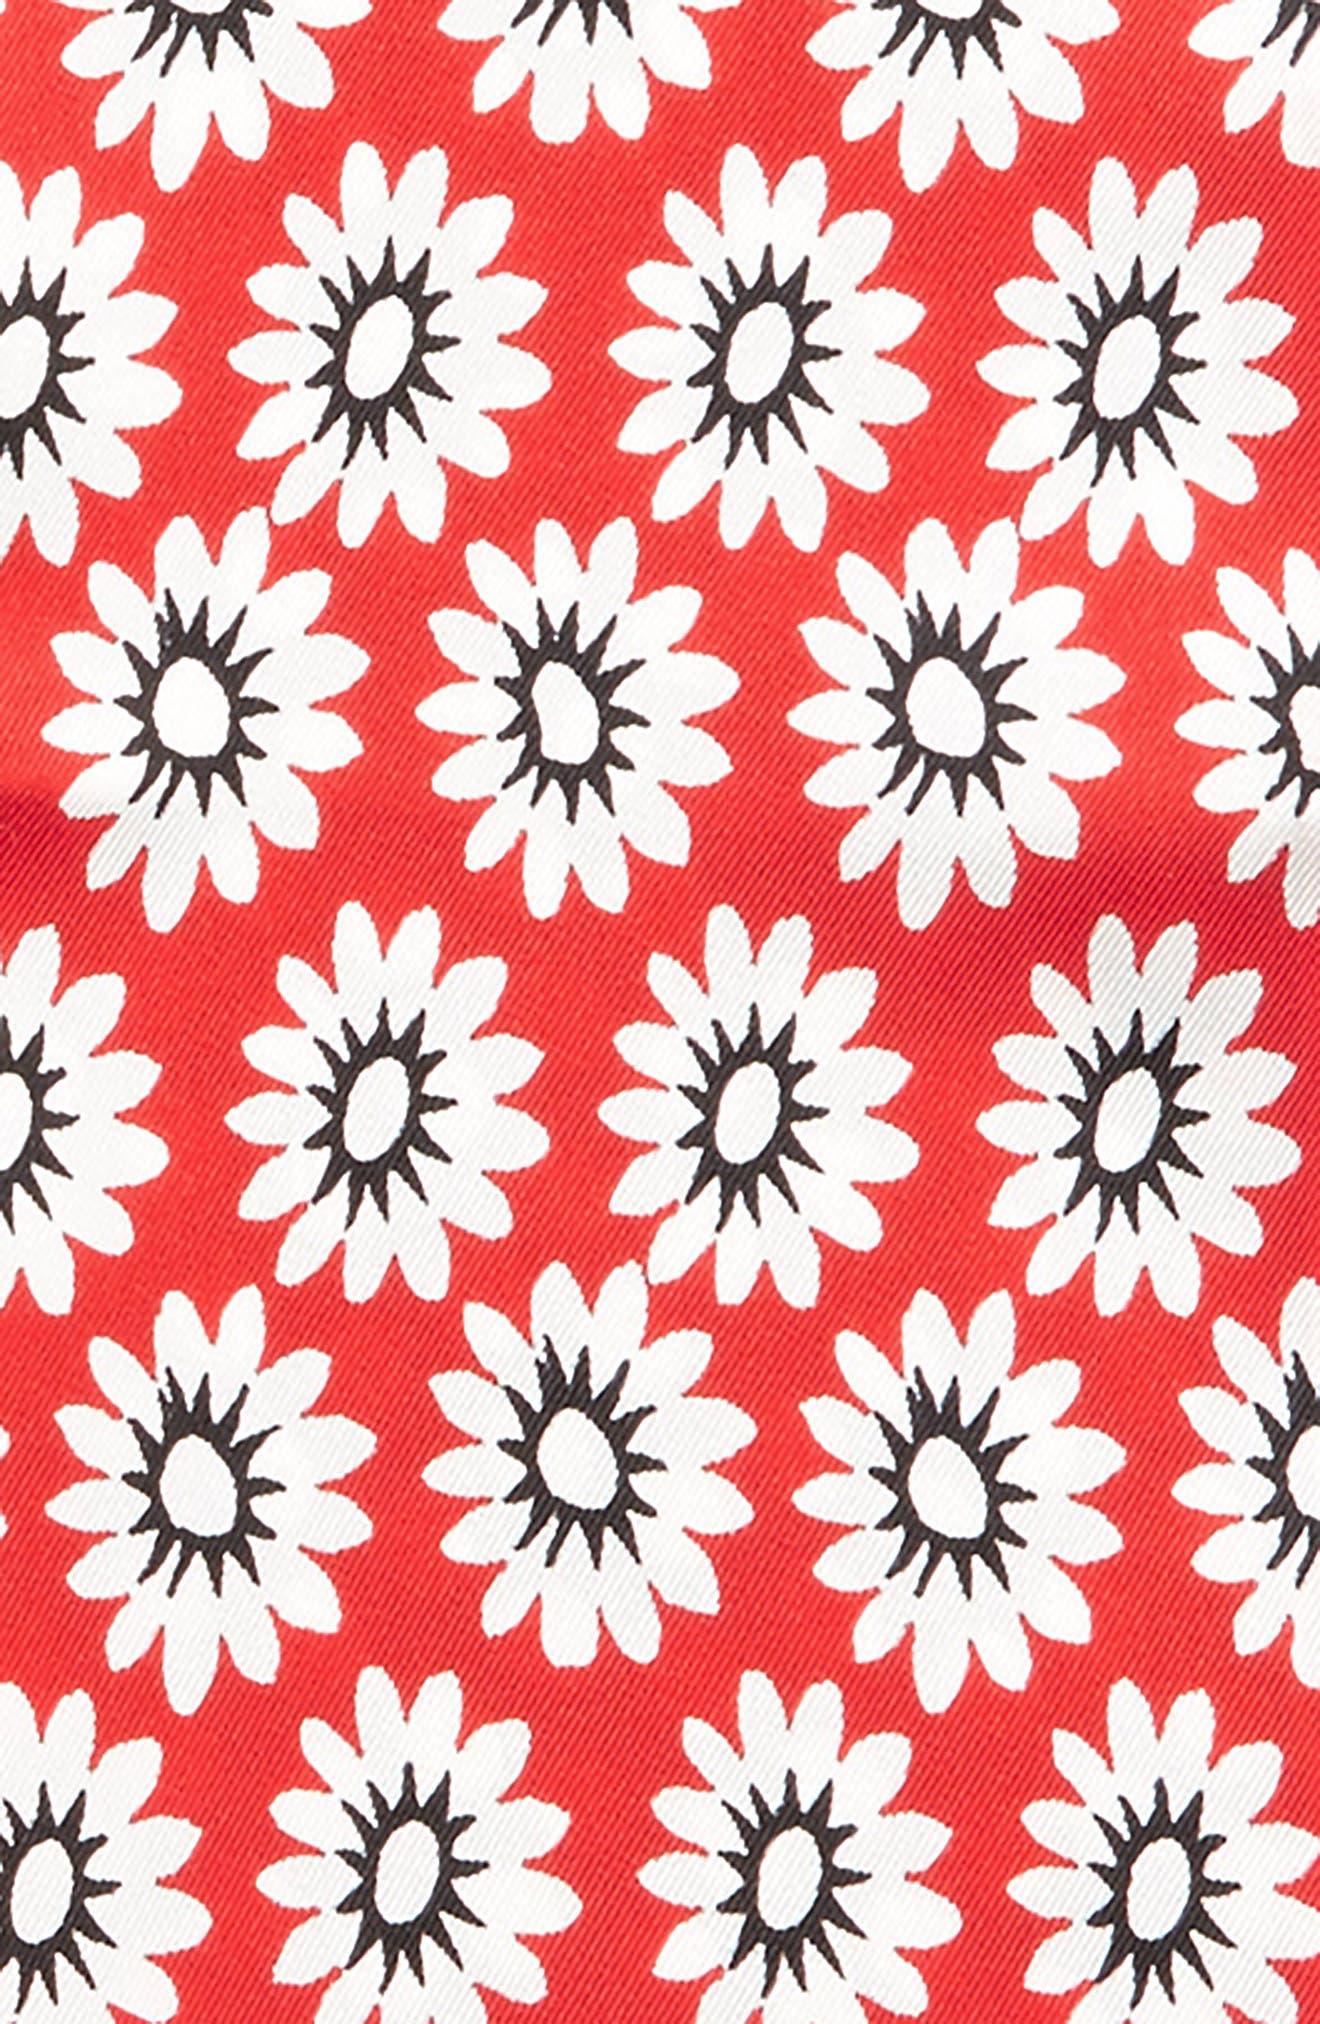 Flower Print Skinny Silk Twill Scarf,                             Alternate thumbnail 3, color,                             600